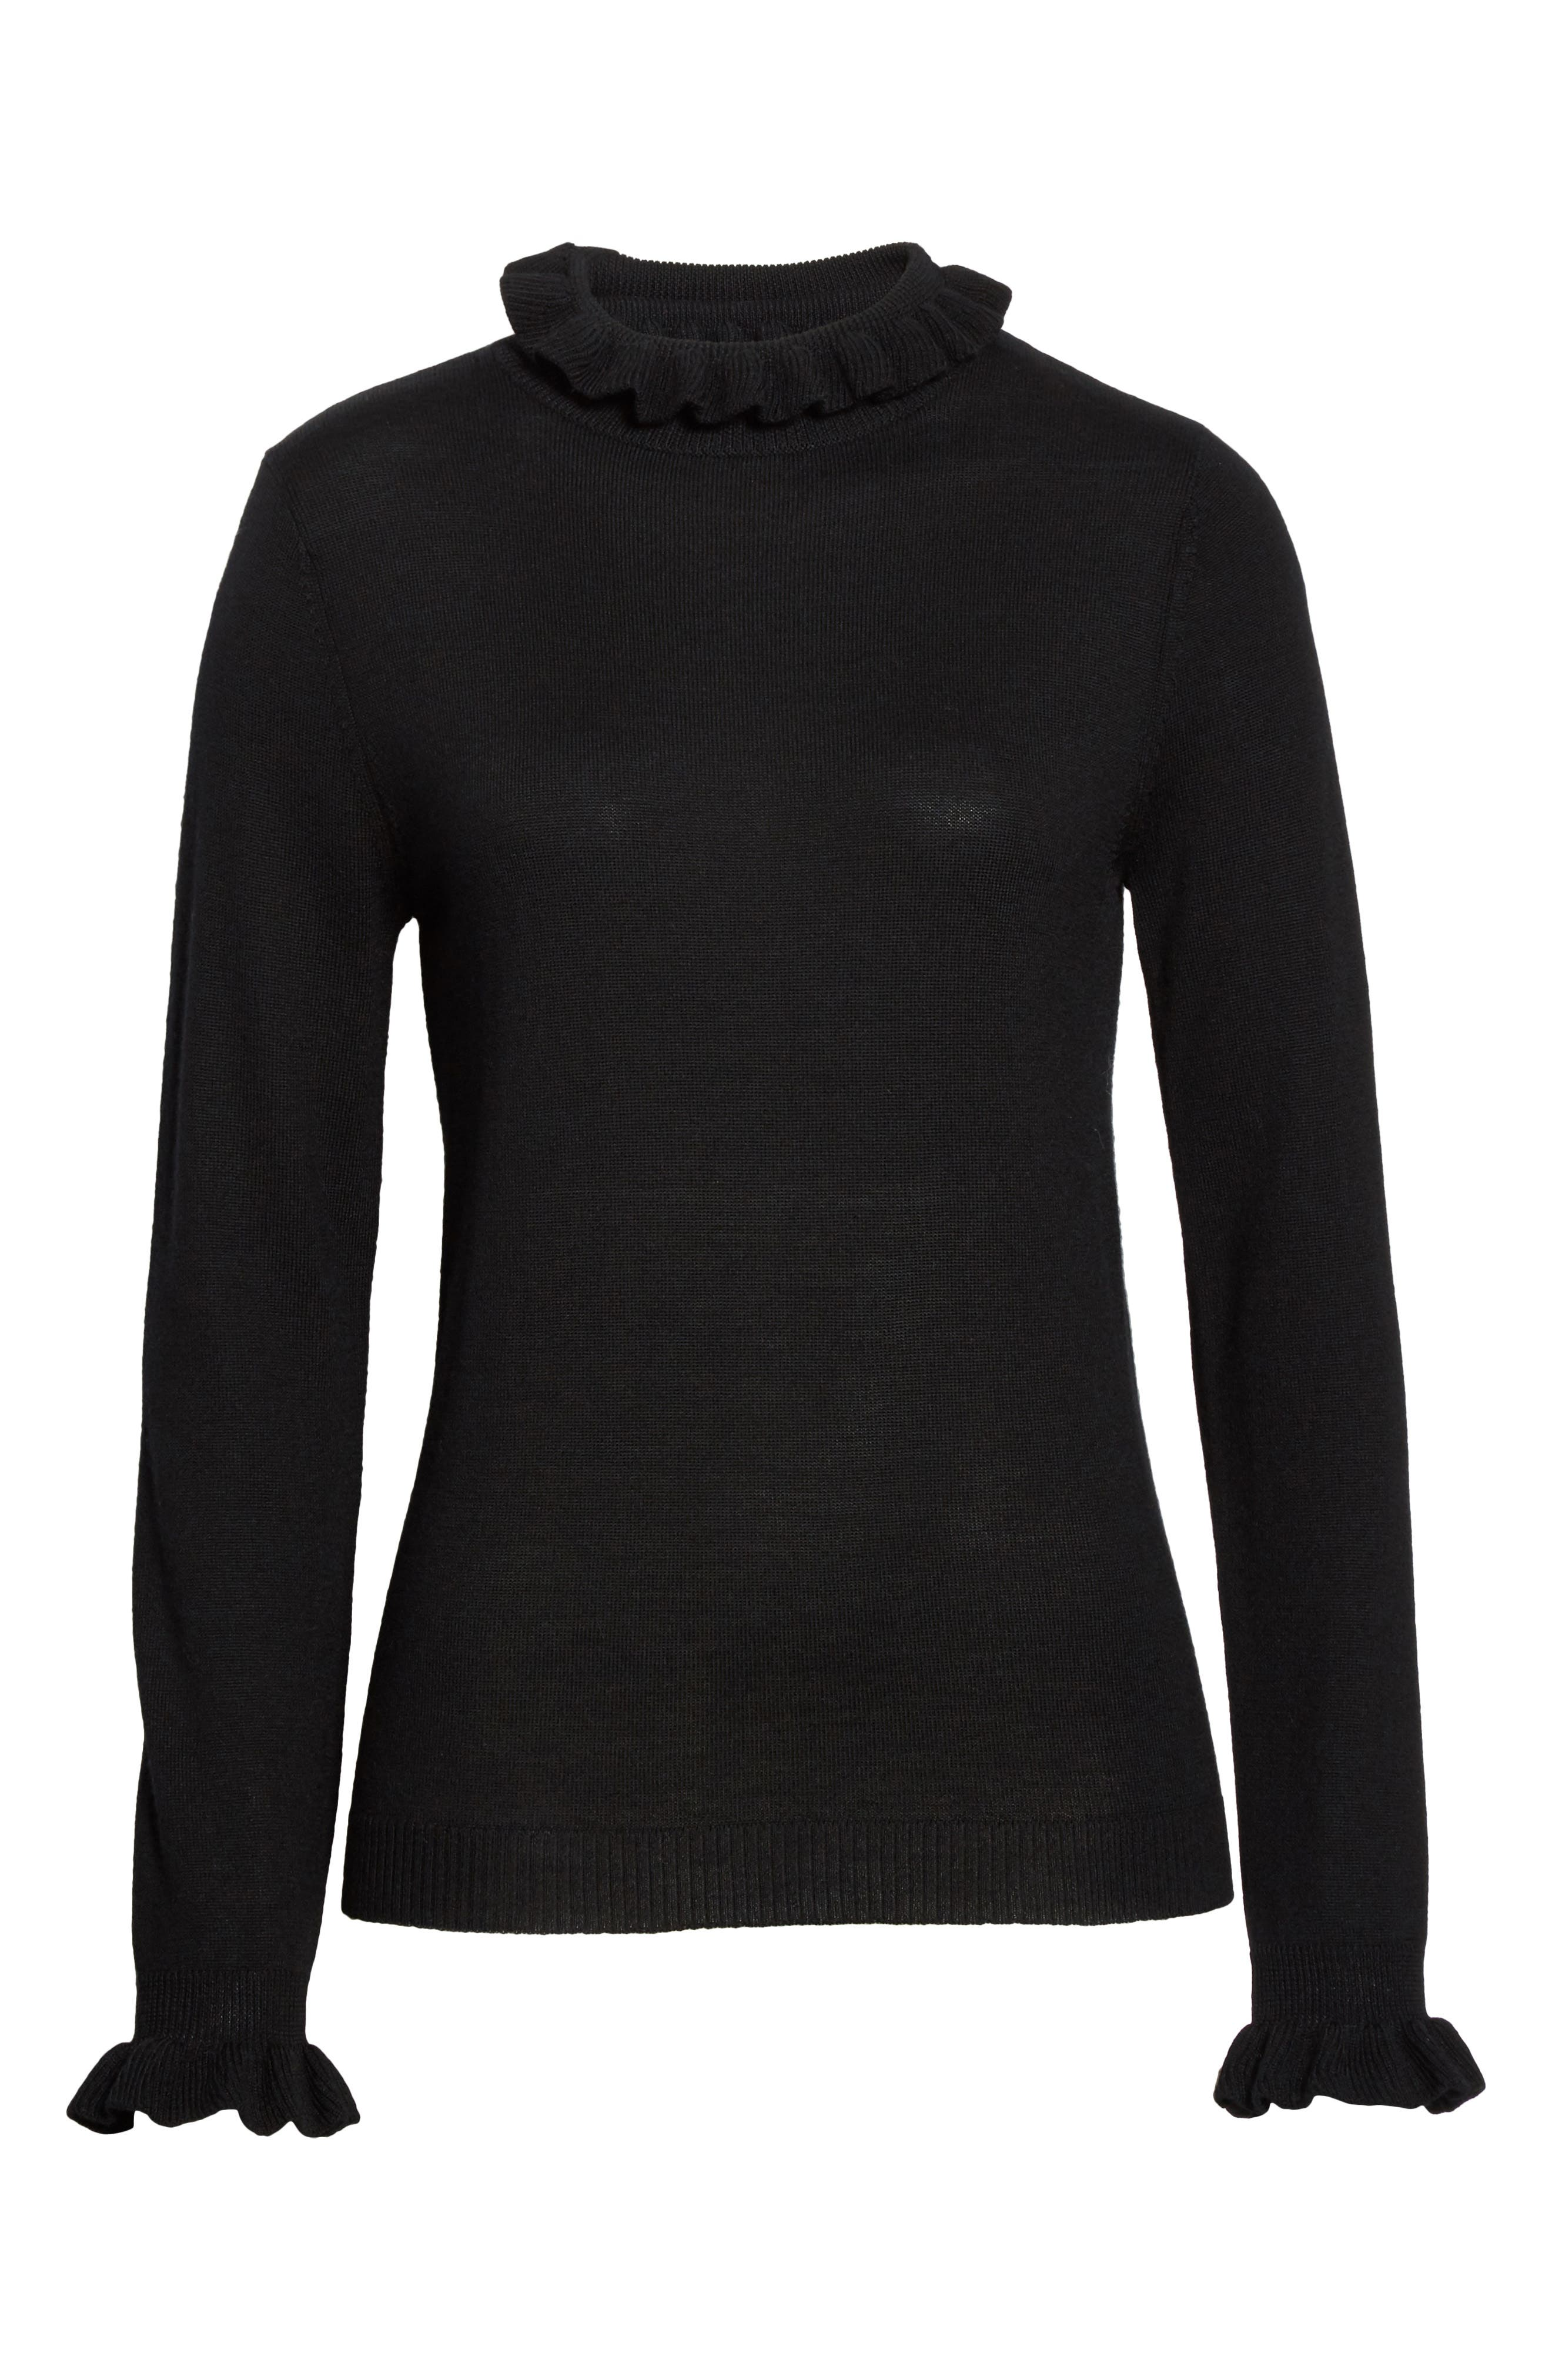 Robin Frill Wool Sweater,                             Alternate thumbnail 6, color,                             Black